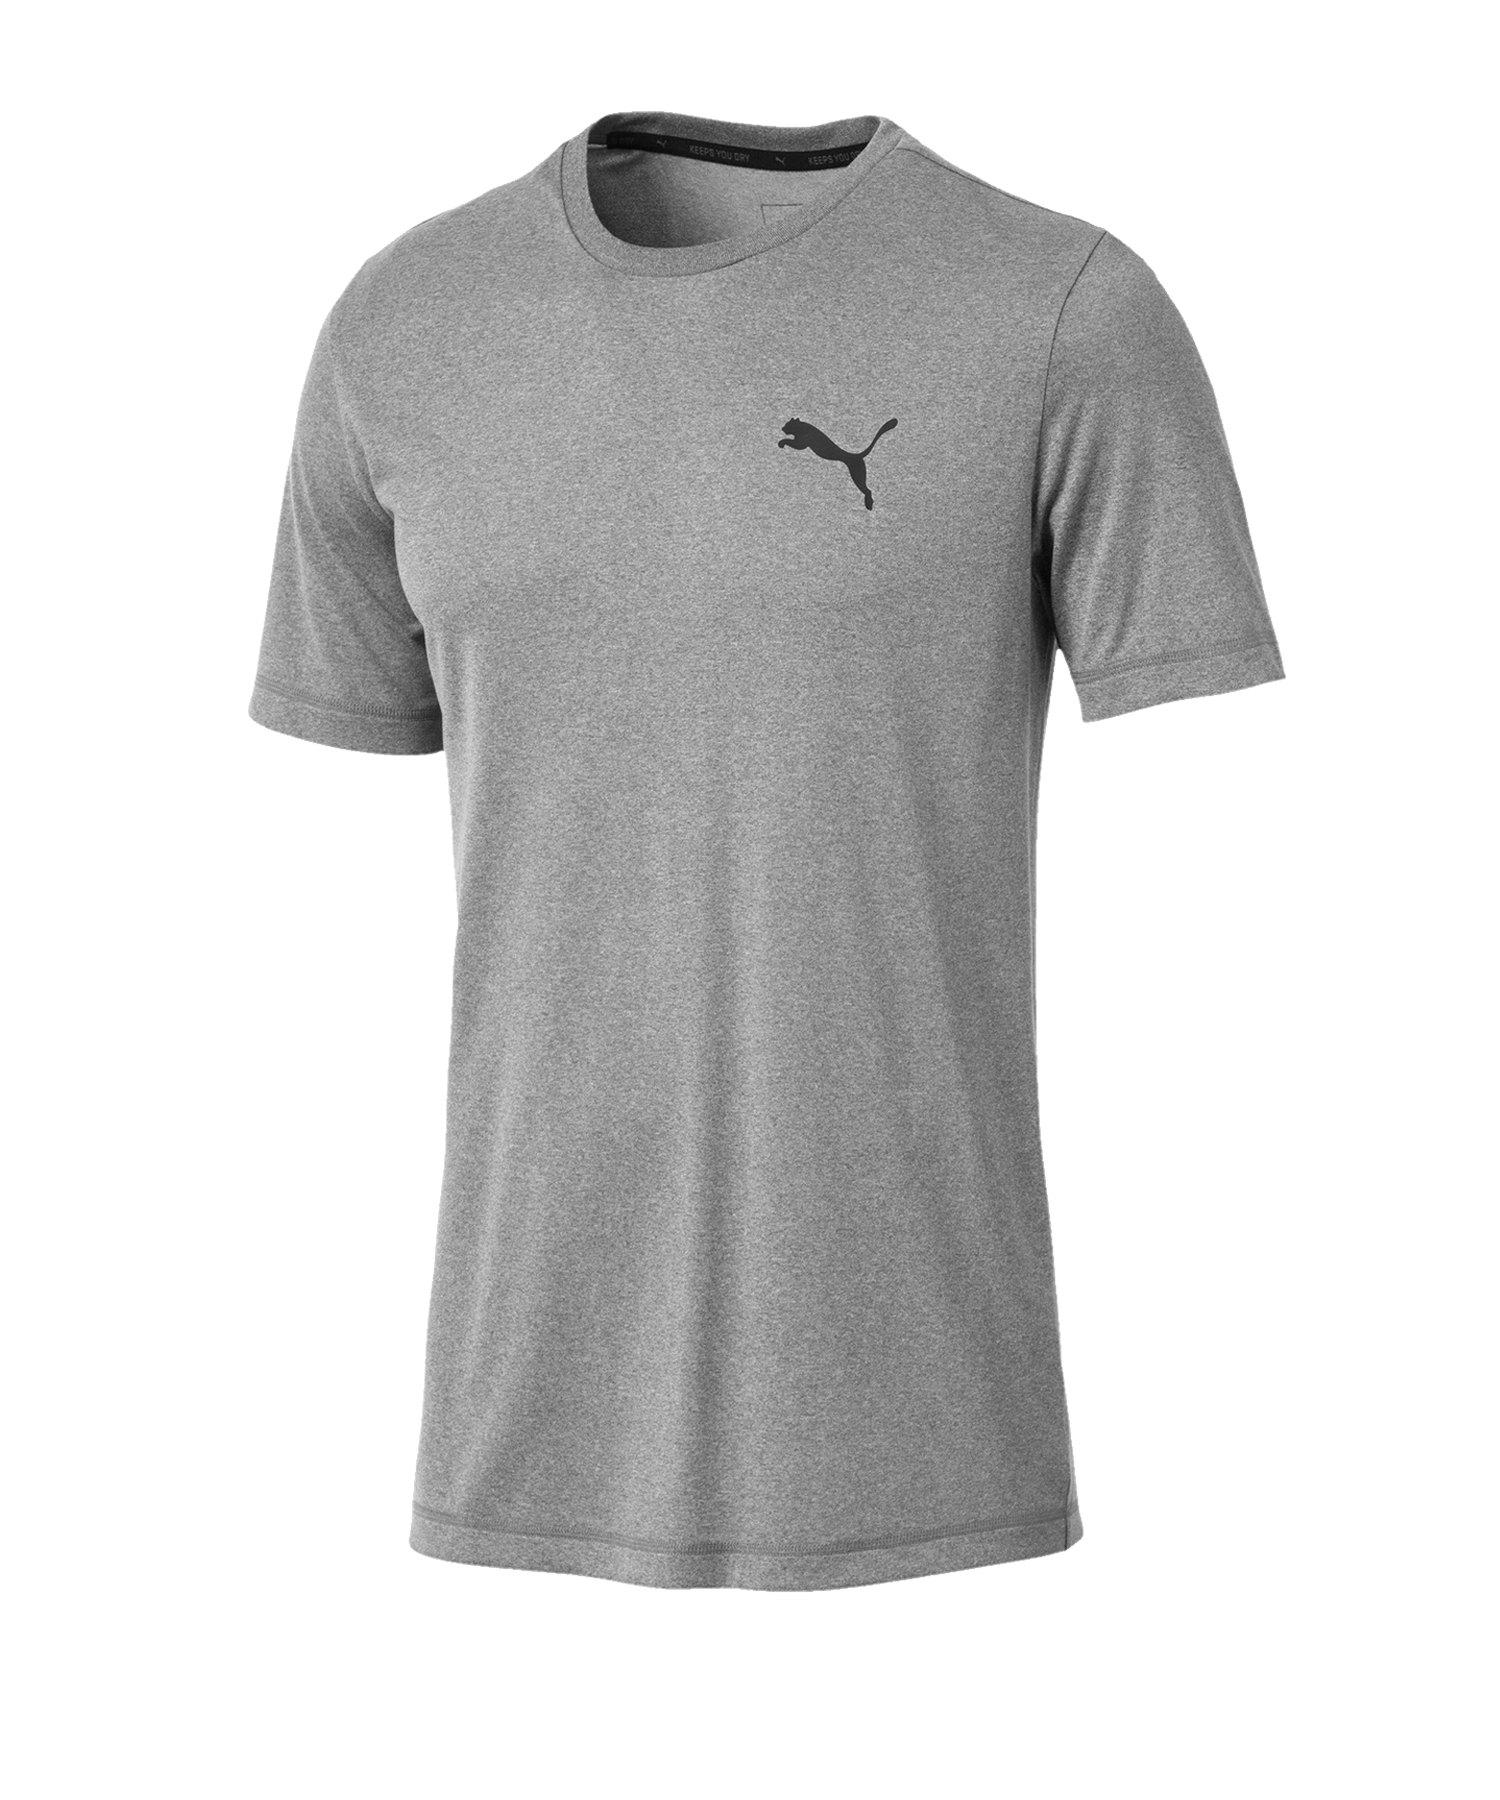 PUMA Active Tee T-Shirt Grau F03 - grau